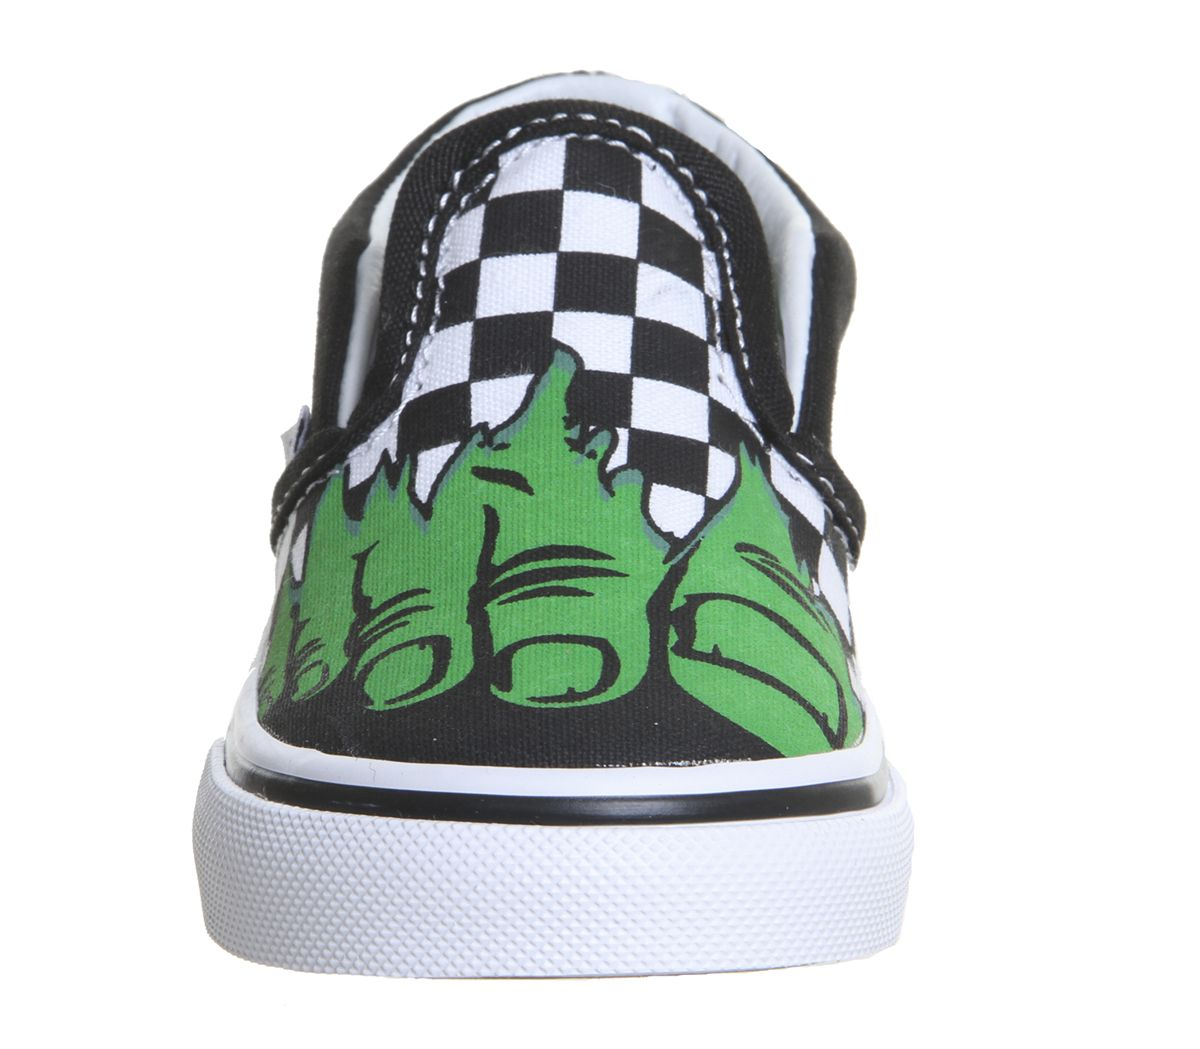 d63ef2377d Vans Classic Slip On Toddlers Hulk Checkerboard Marvel - Unisex